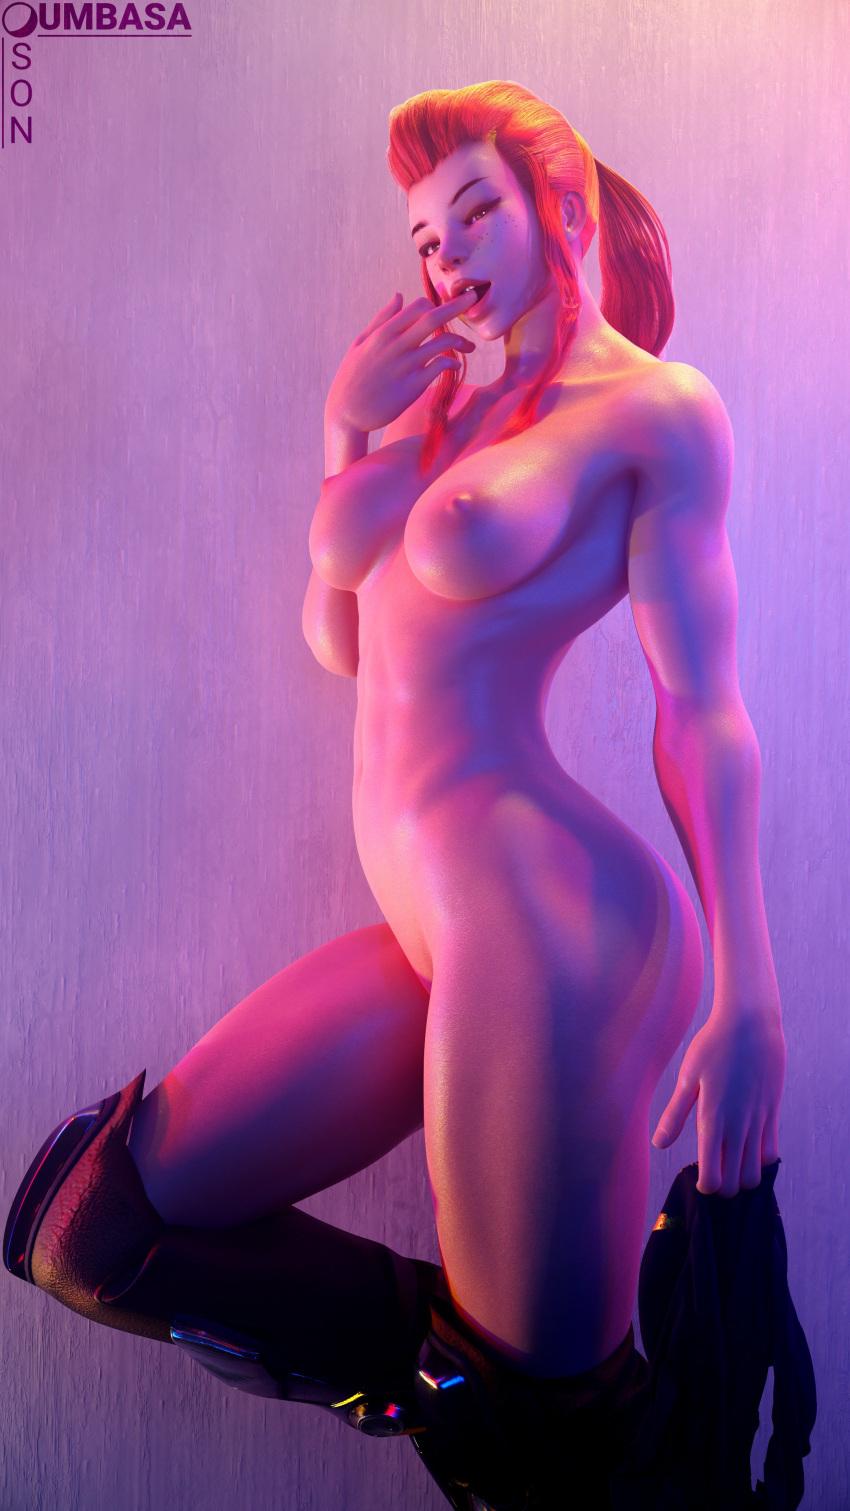 overwatch-rulex-–-breasts,-son-umbasa,-female,-solo,-brigitte.